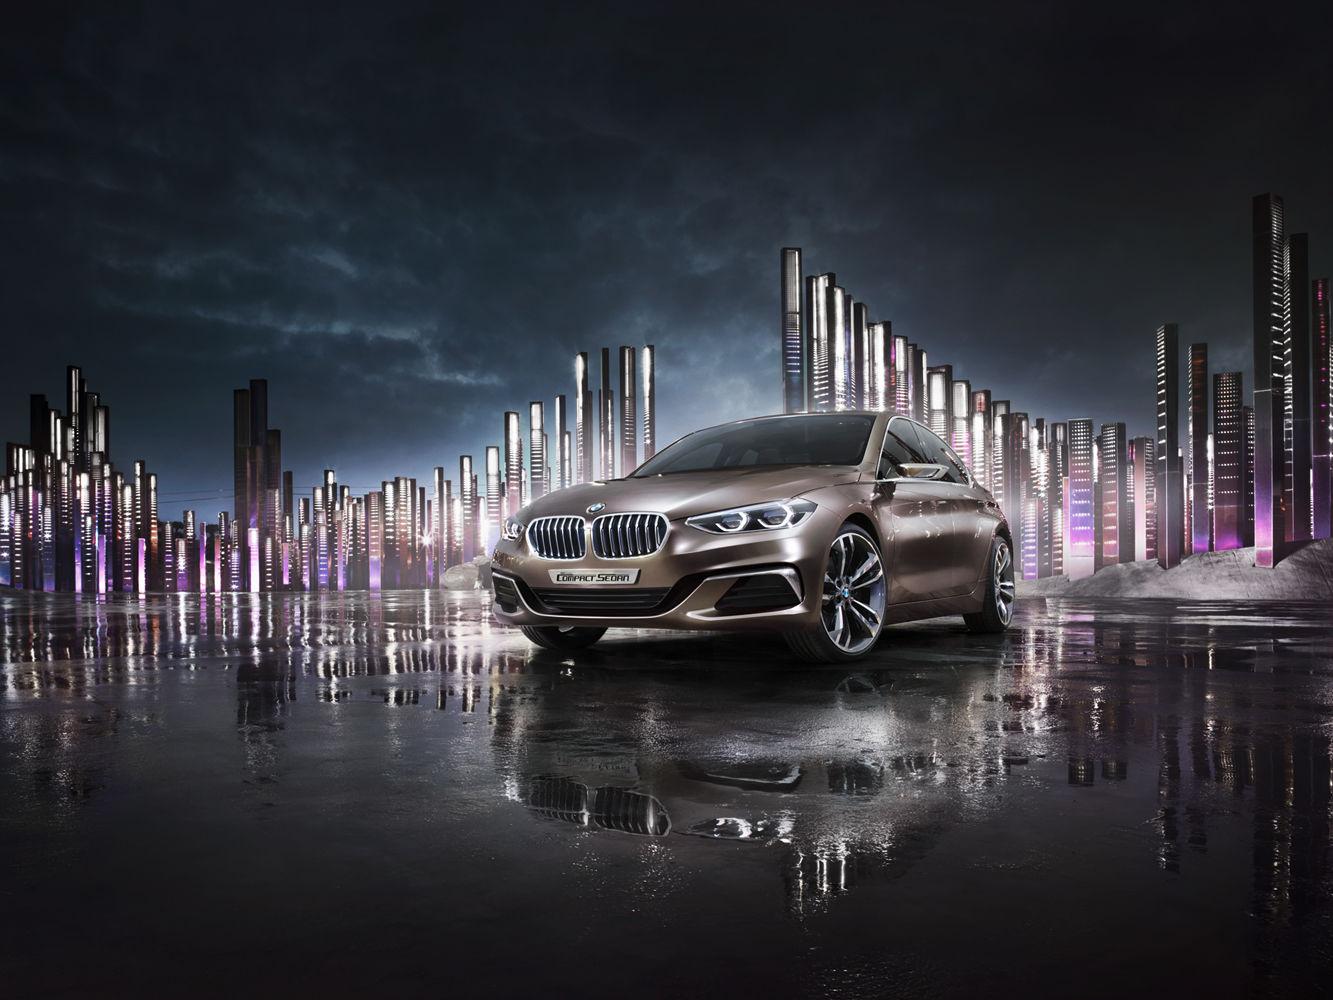 ANKE LUCKMANN for BMW CONCEPT COMPACT SEDAN